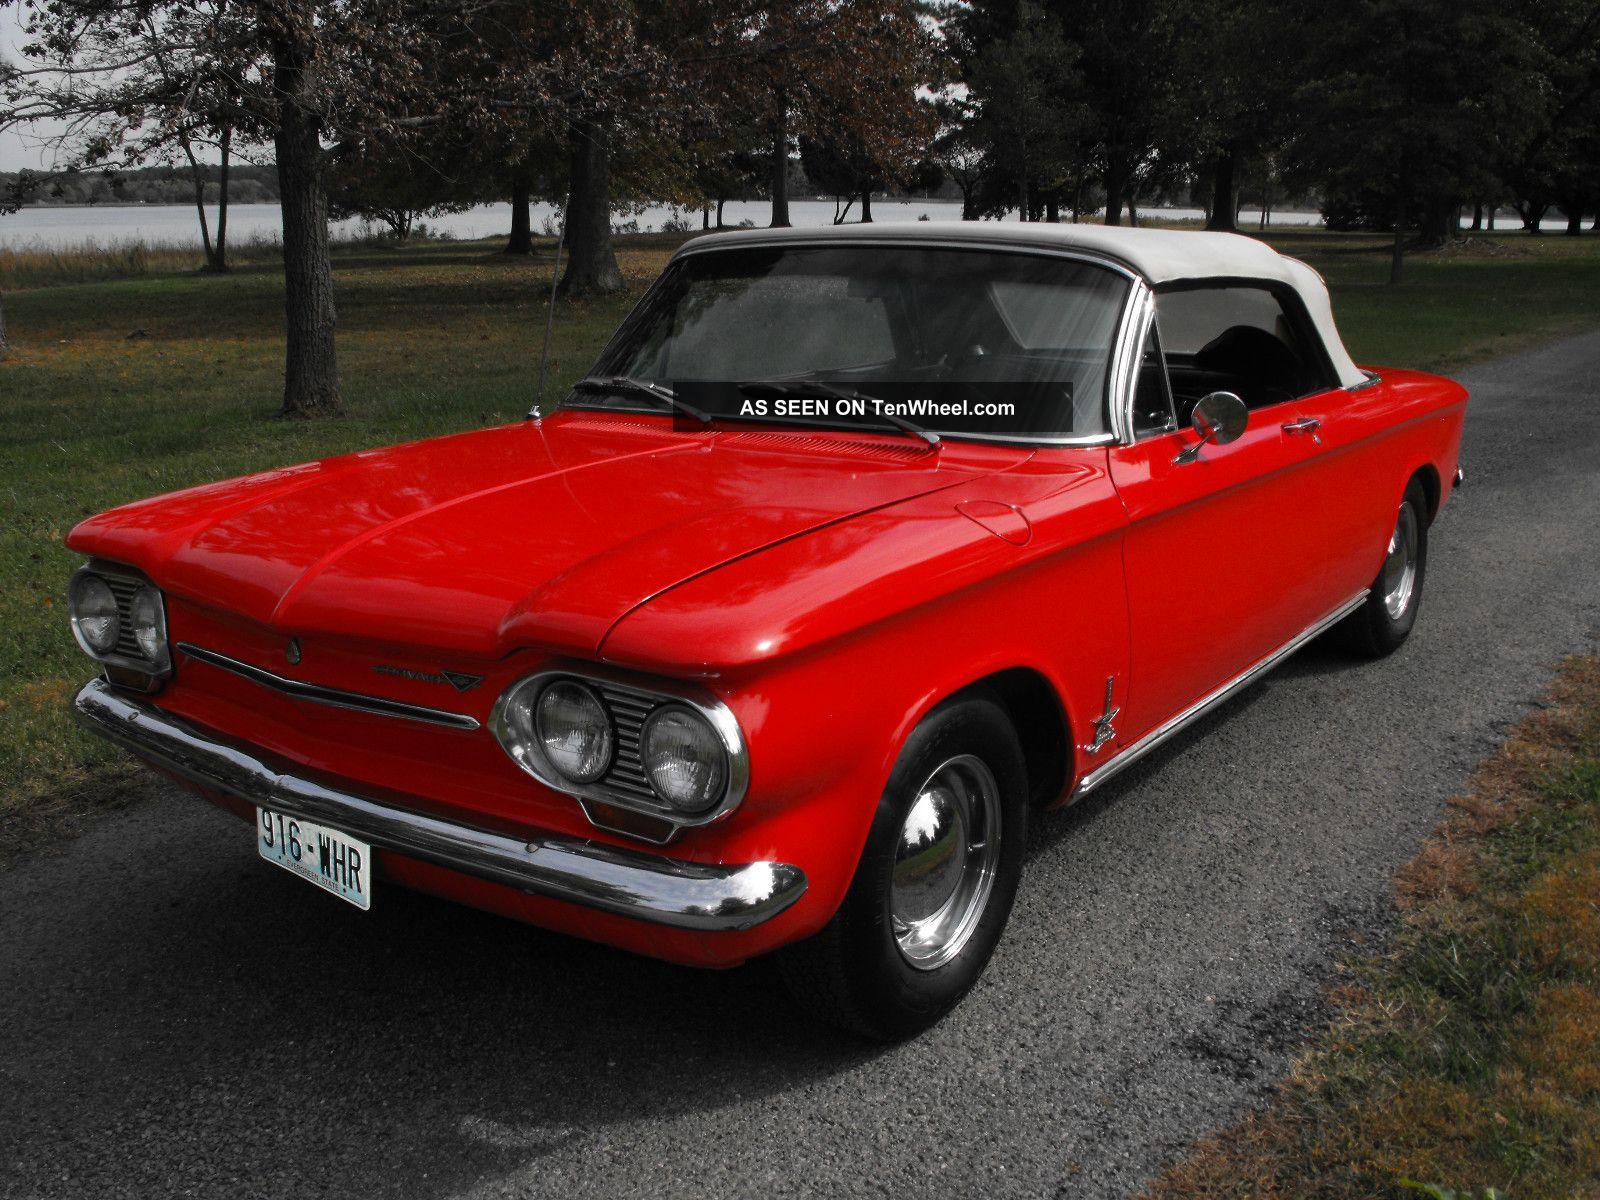 1963 Chevrolet Corvair Monza Spyder Convertible